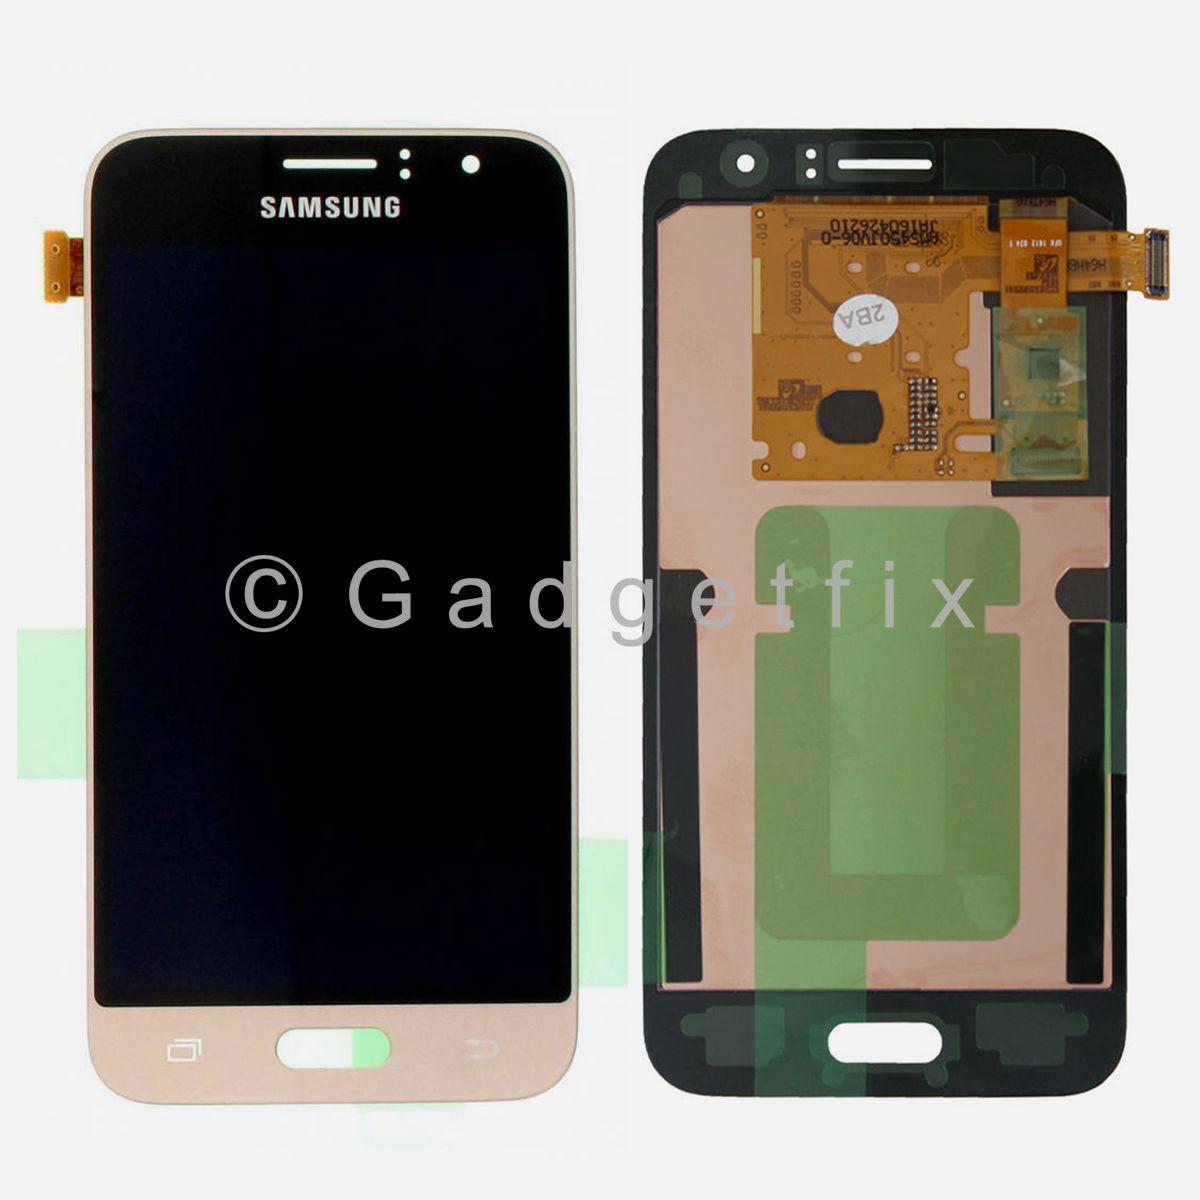 US Gold Samsung Galaxy Express 3 J120A LCD Display Screen ...